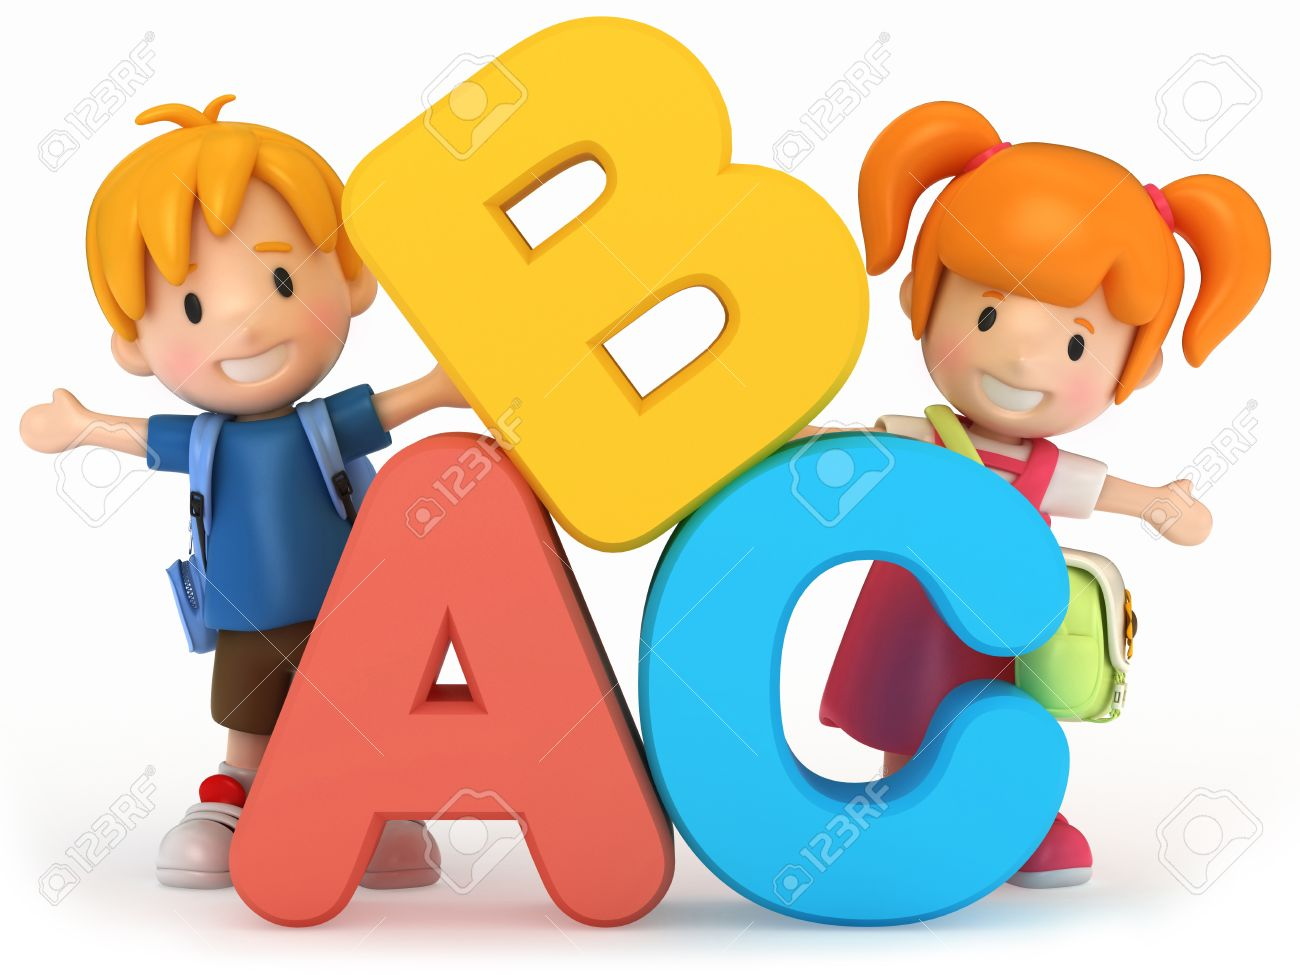 Abc clipart kids image download Abc Clipart Images   Free download best Abc Clipart Images on ... image download